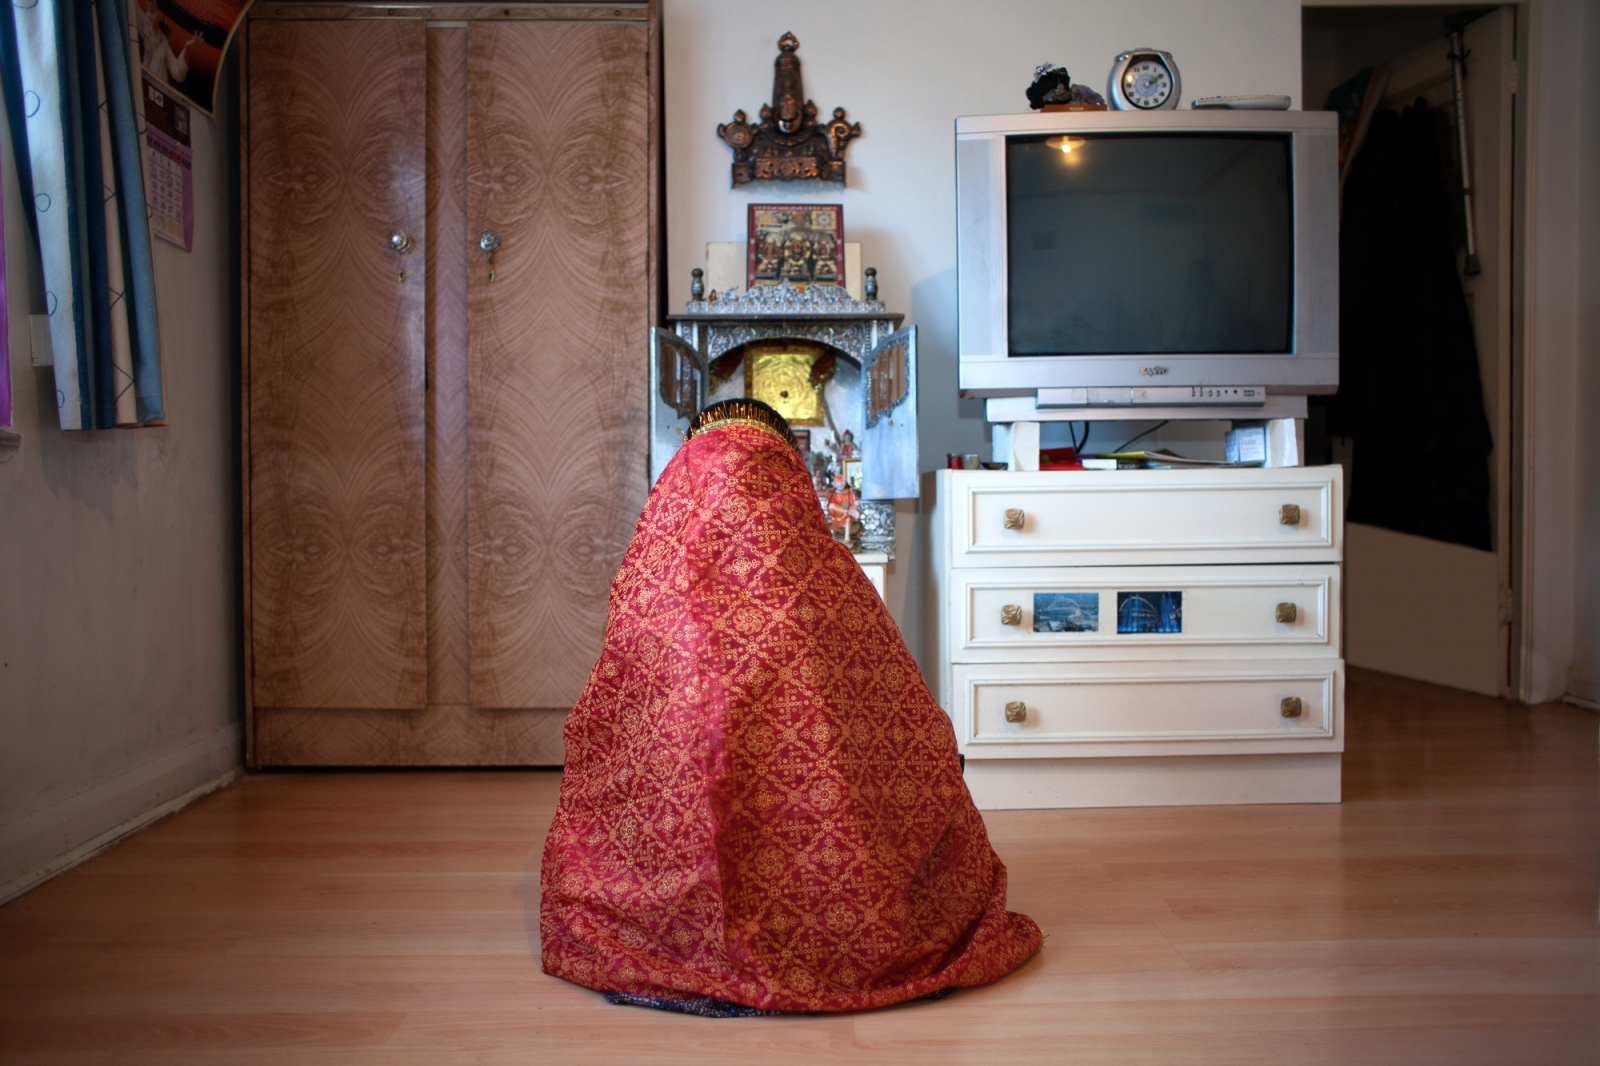 Wembley, UK, October 6, 2012: Shanta Ben Makwana, 63, poses for a portrait inside her apartment.